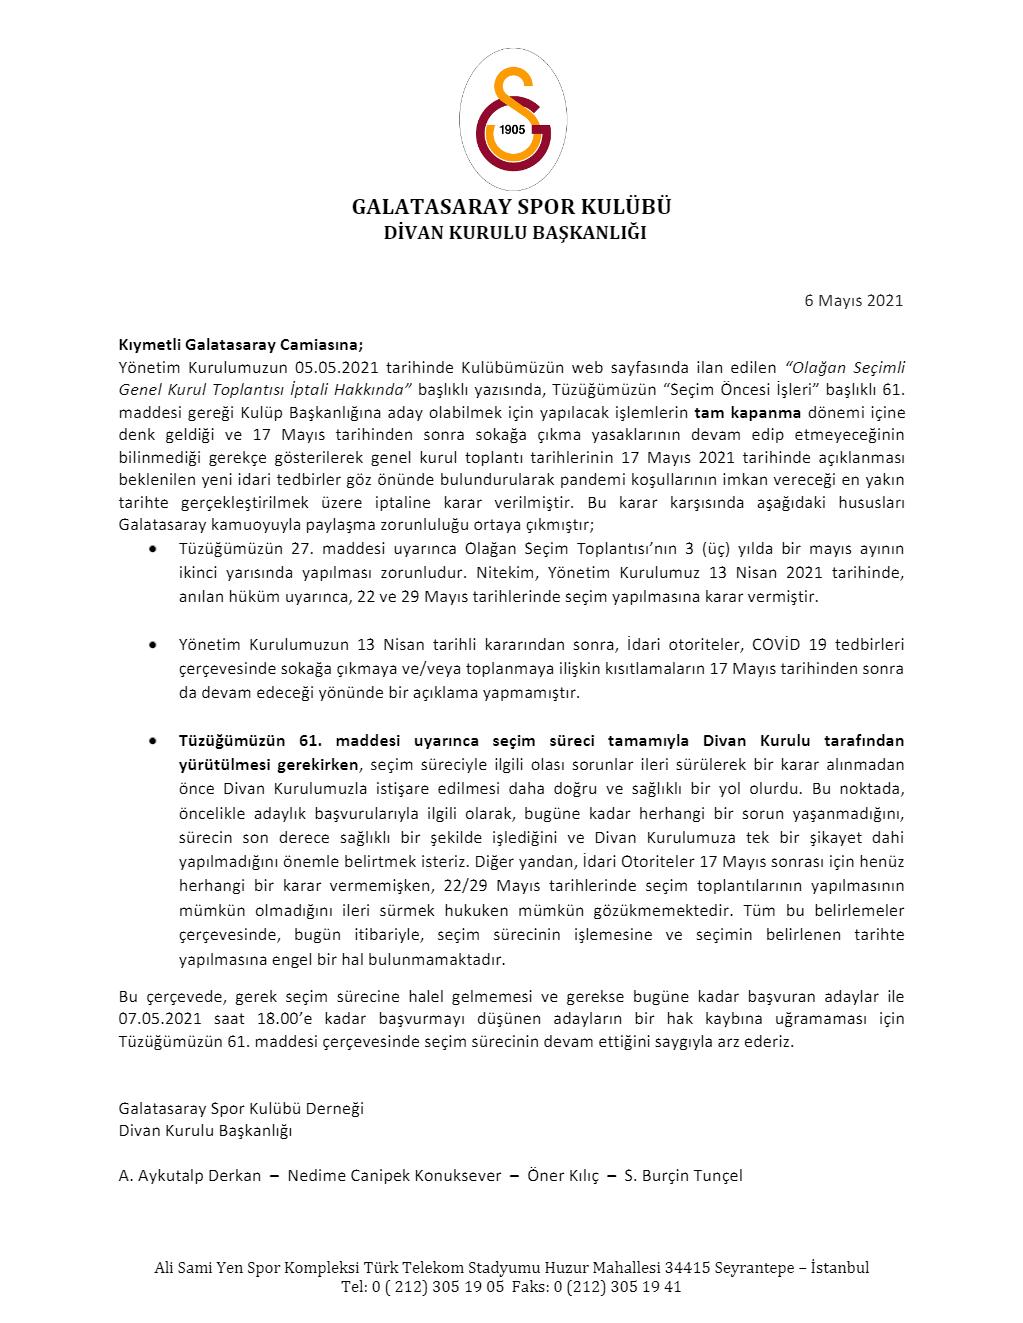 Galatasaray Divan Kurulu seçim süreci